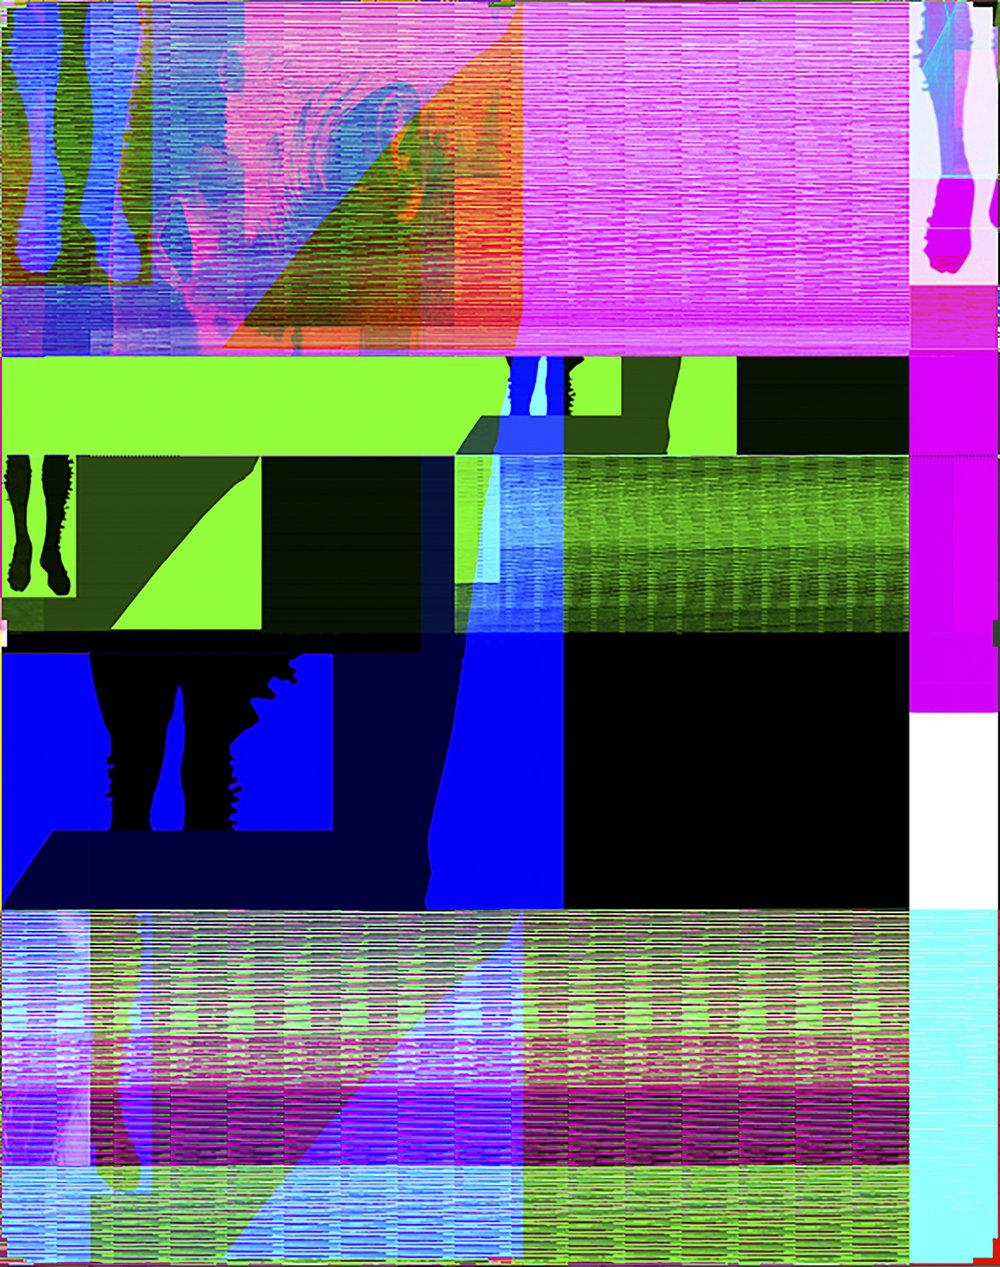 Untitled(11.26.14).jpg